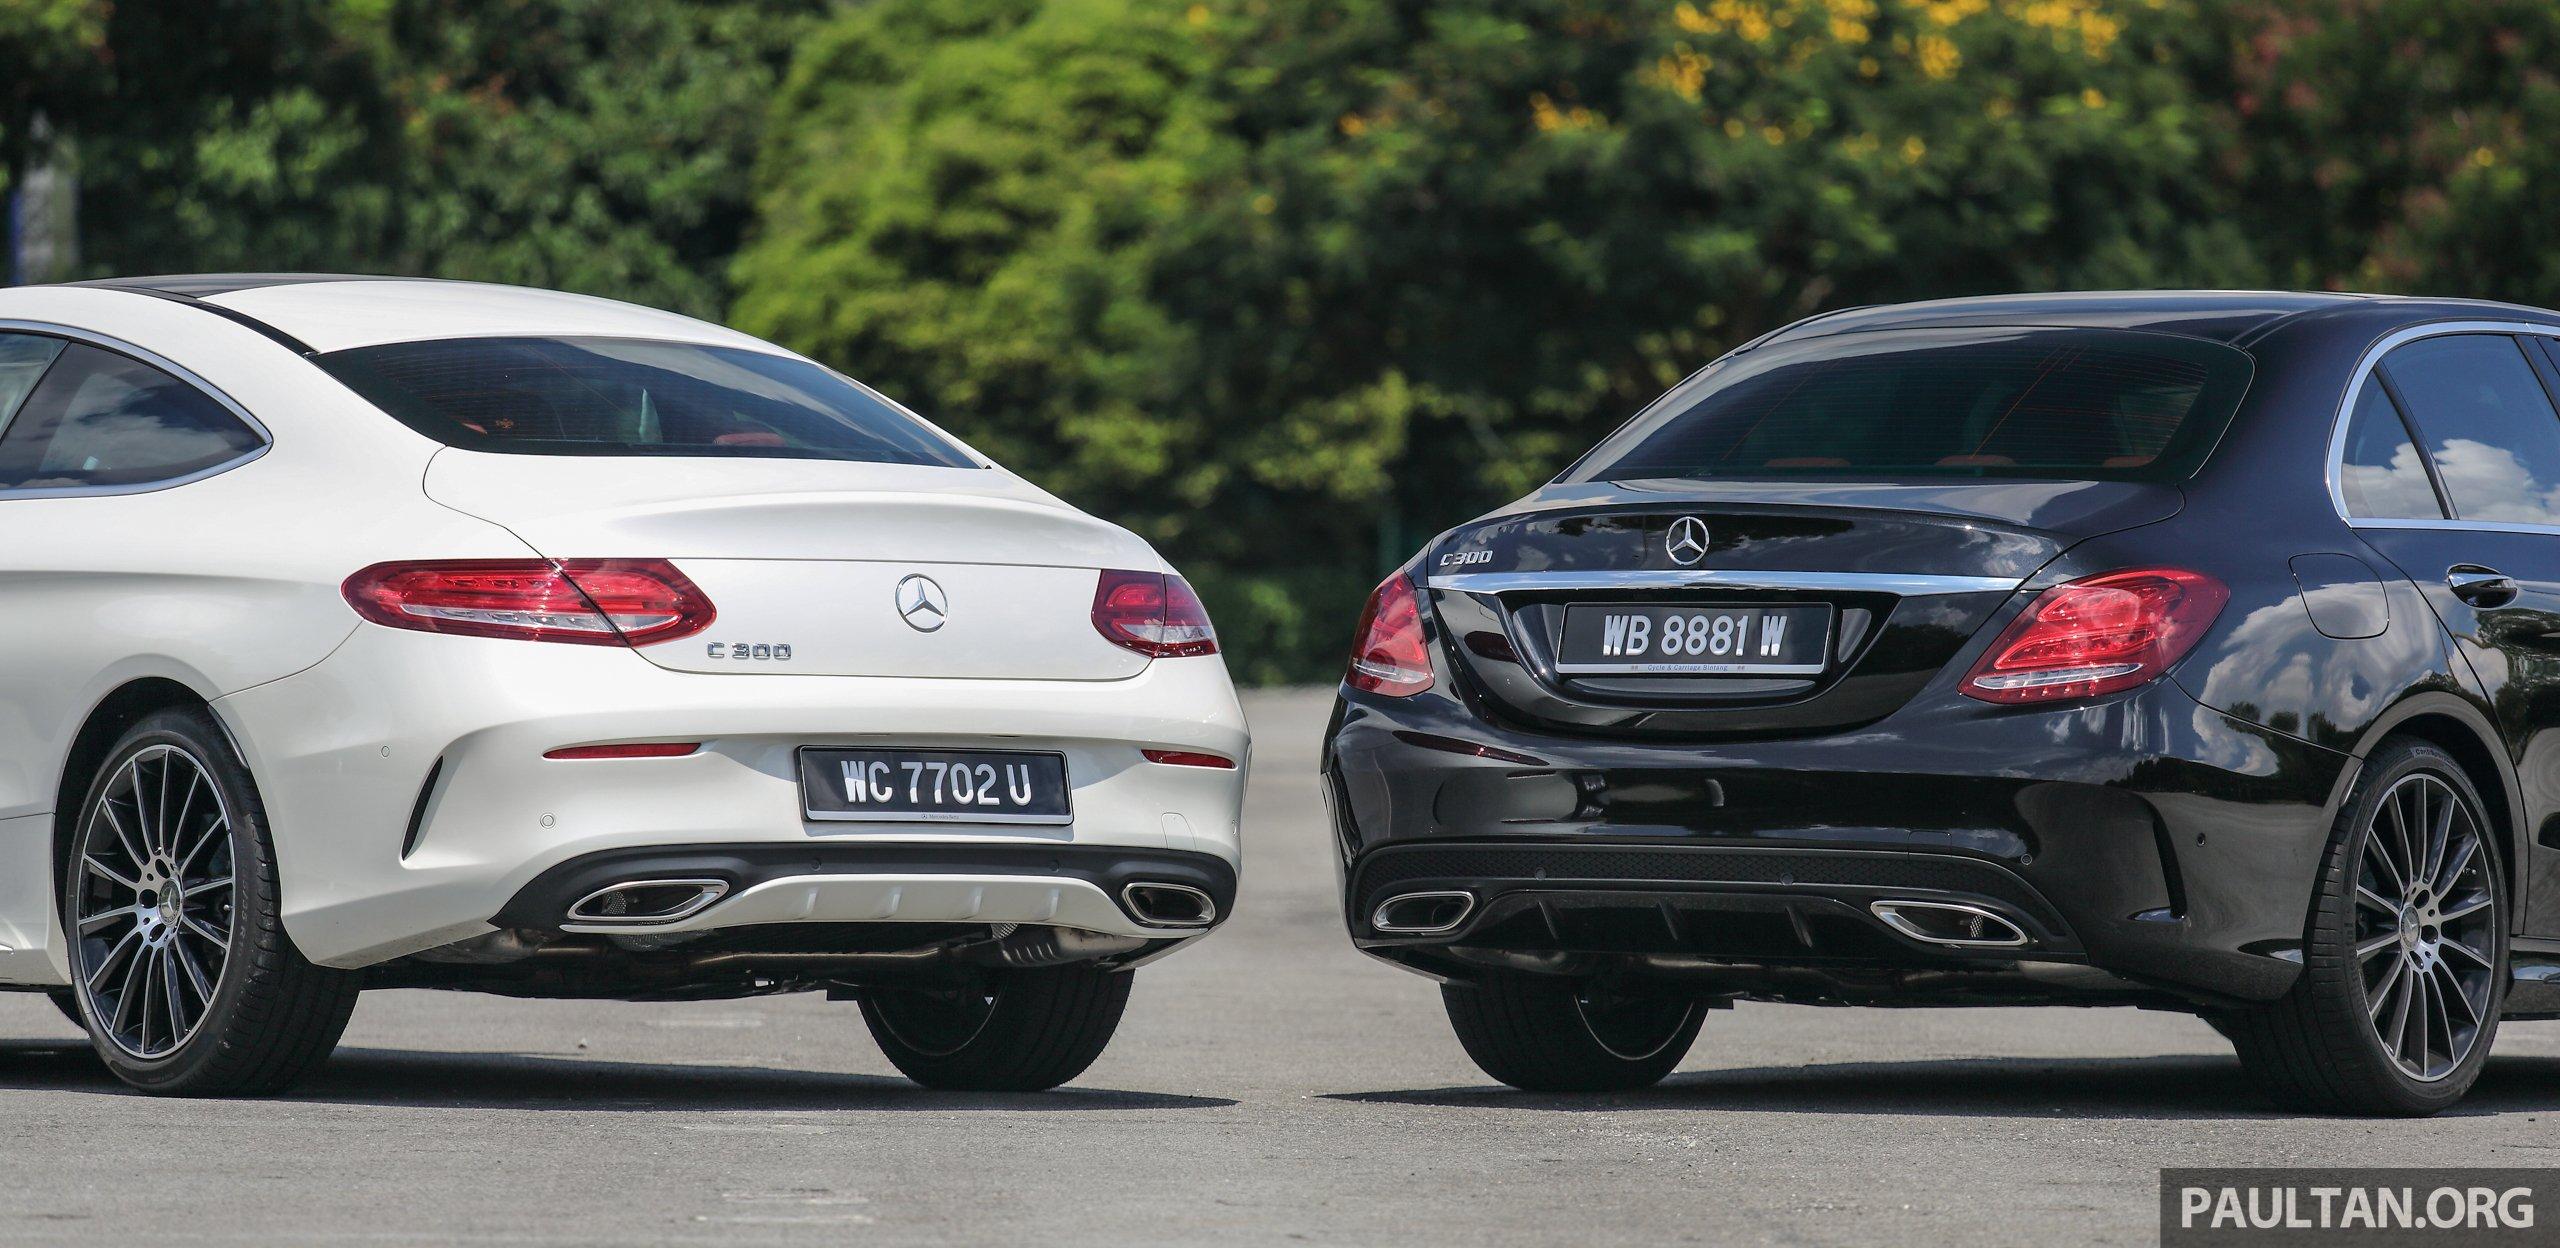 Gallery Mercedes Benz C300 Coupe Vs Sedan Image 495920